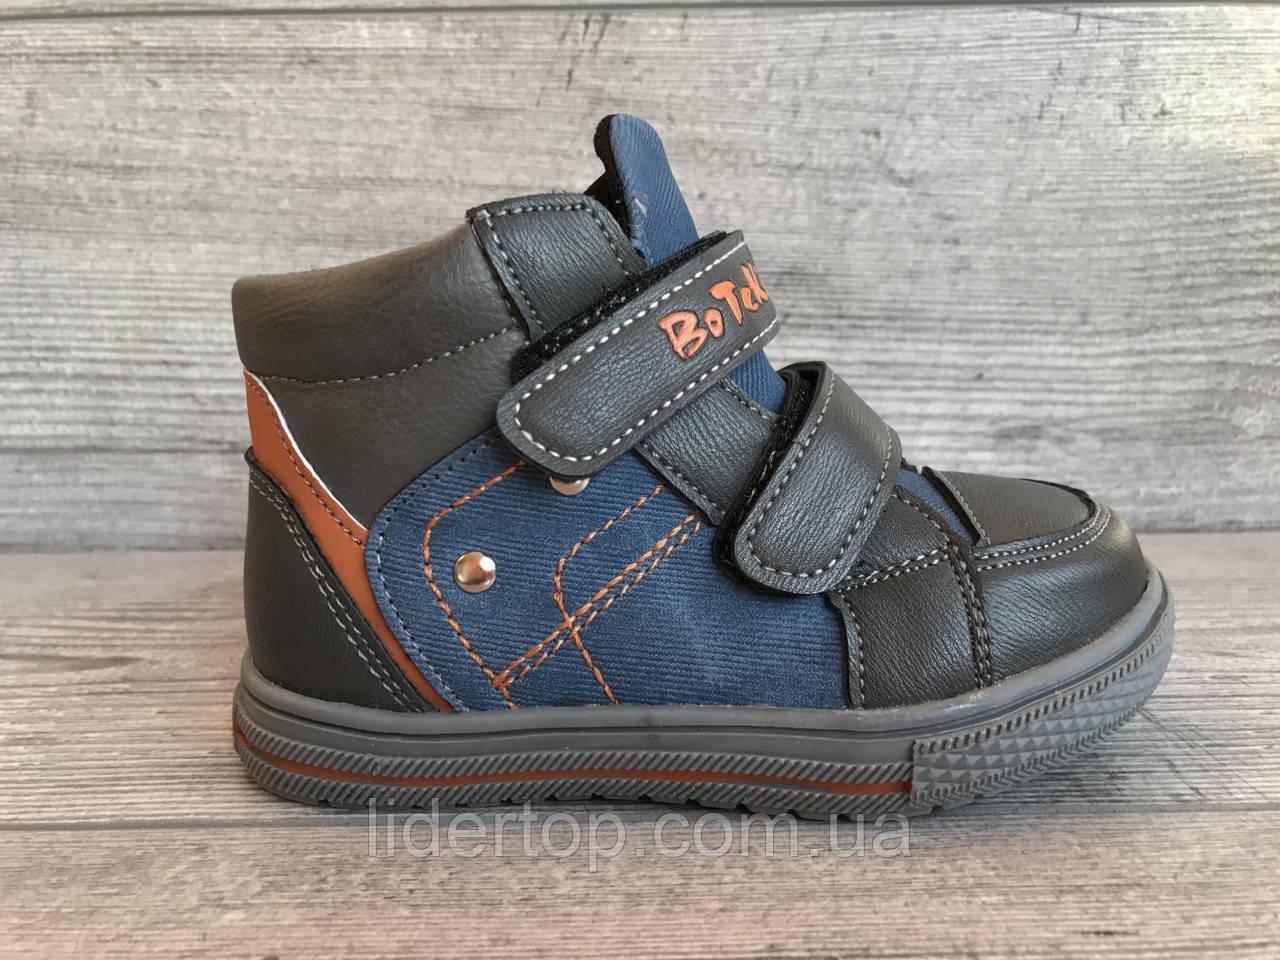 Ботинки демисезон на мальчика ТМ Lilin 22-27 р